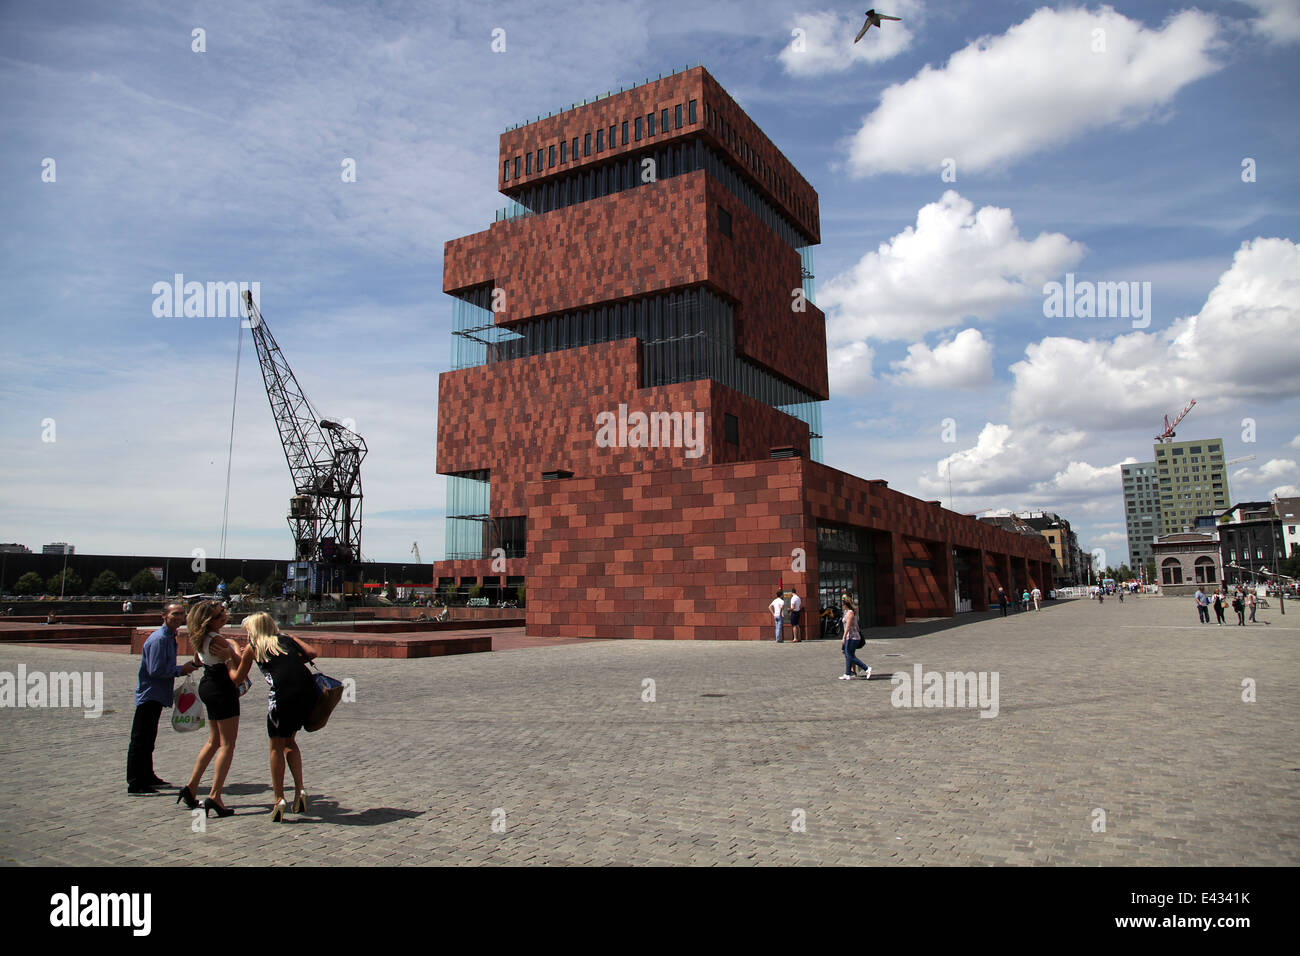 Museum MAS Streetview Street view Antwerp Belgium - Stock Image